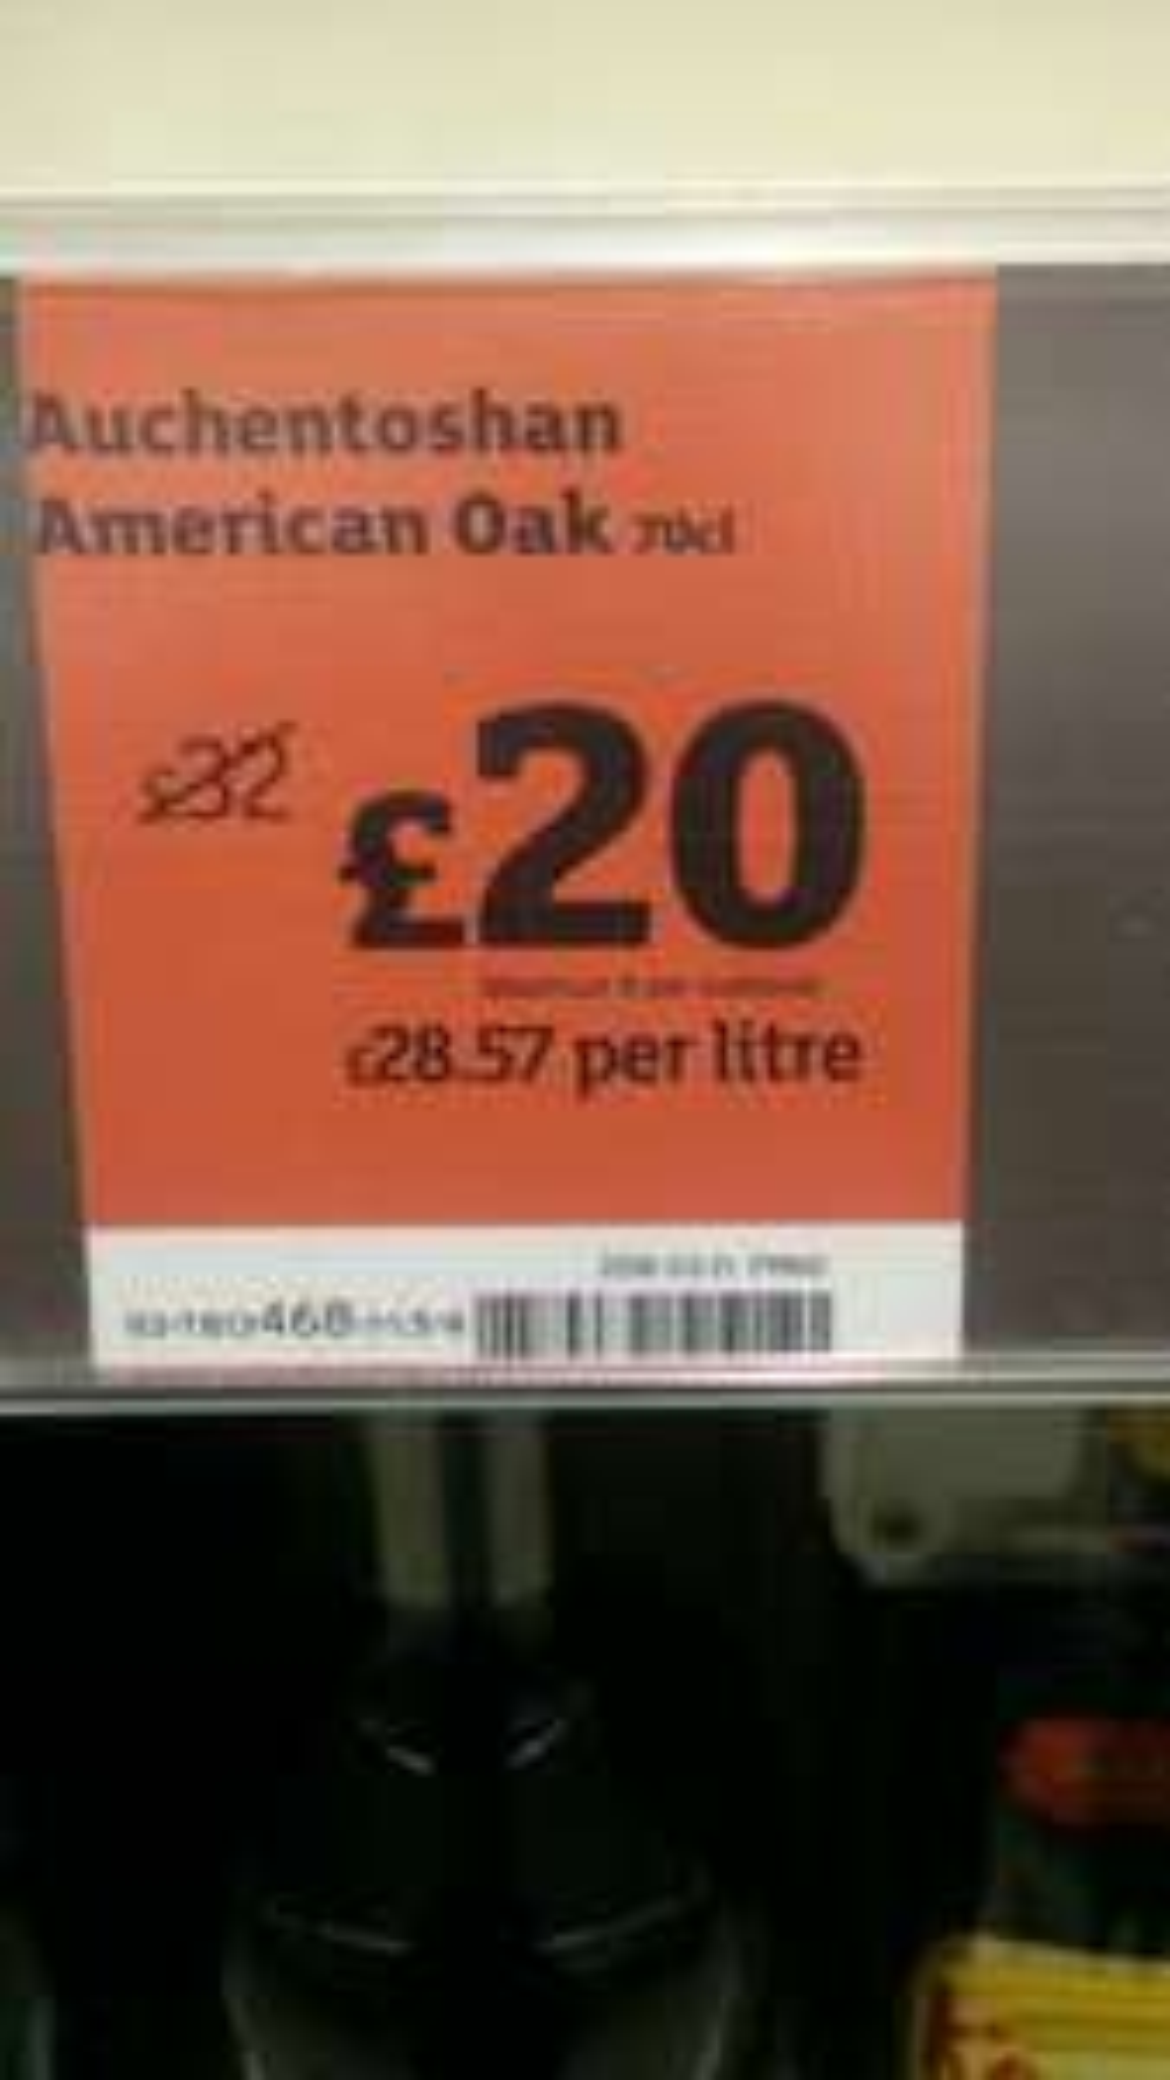 Auchentoshan American Oak 70cl whisky £20 at Sainsbury's